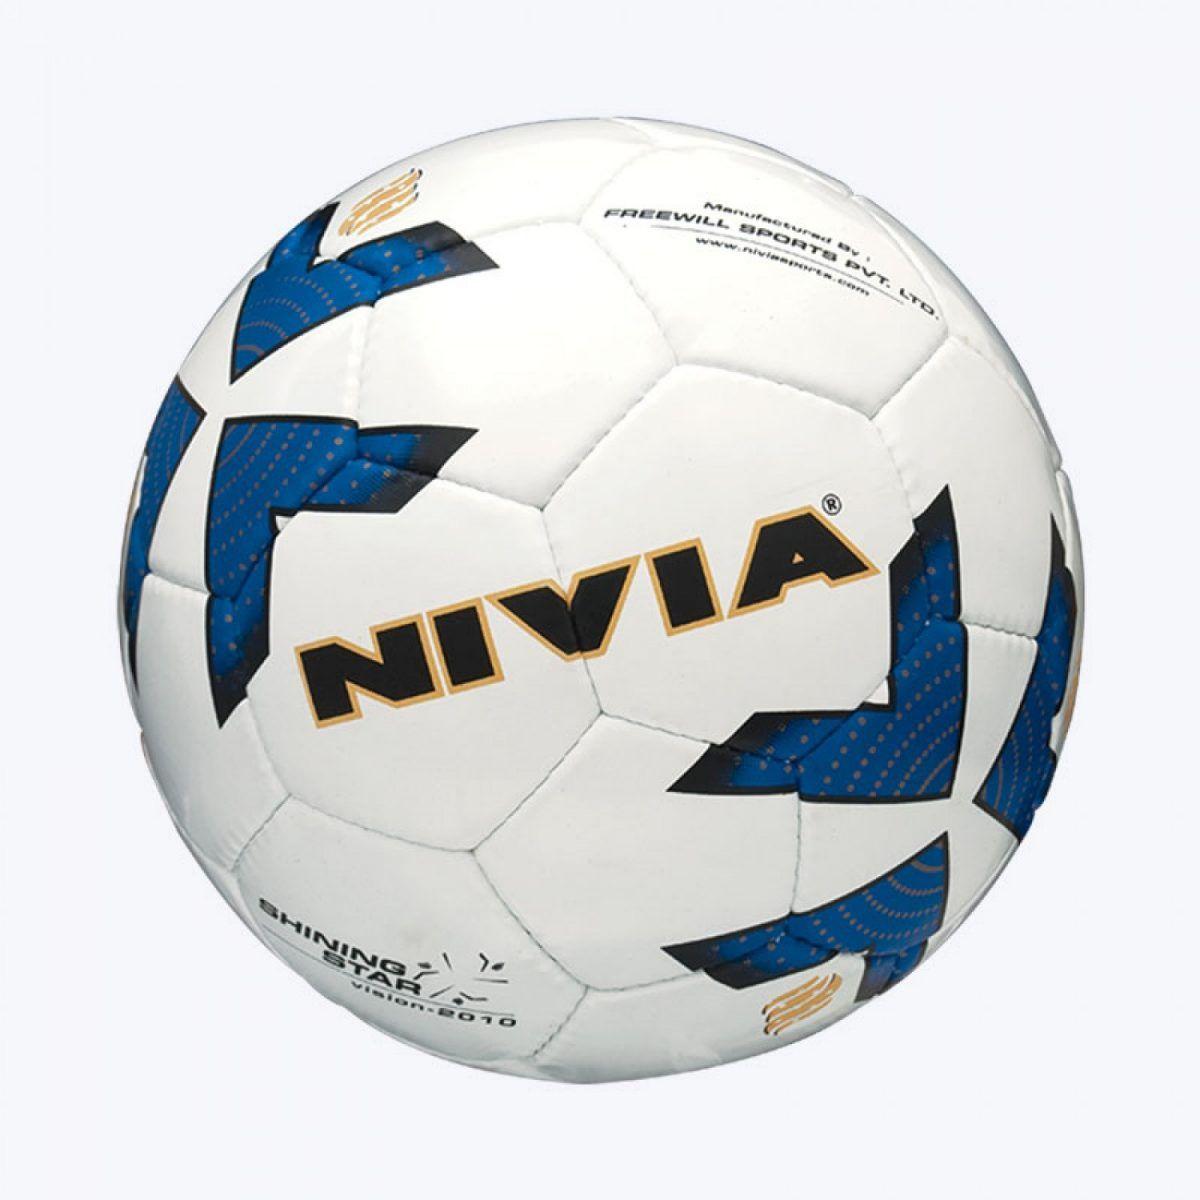 Nivia Shining Star Ambition Football Shining Star Football National Sport